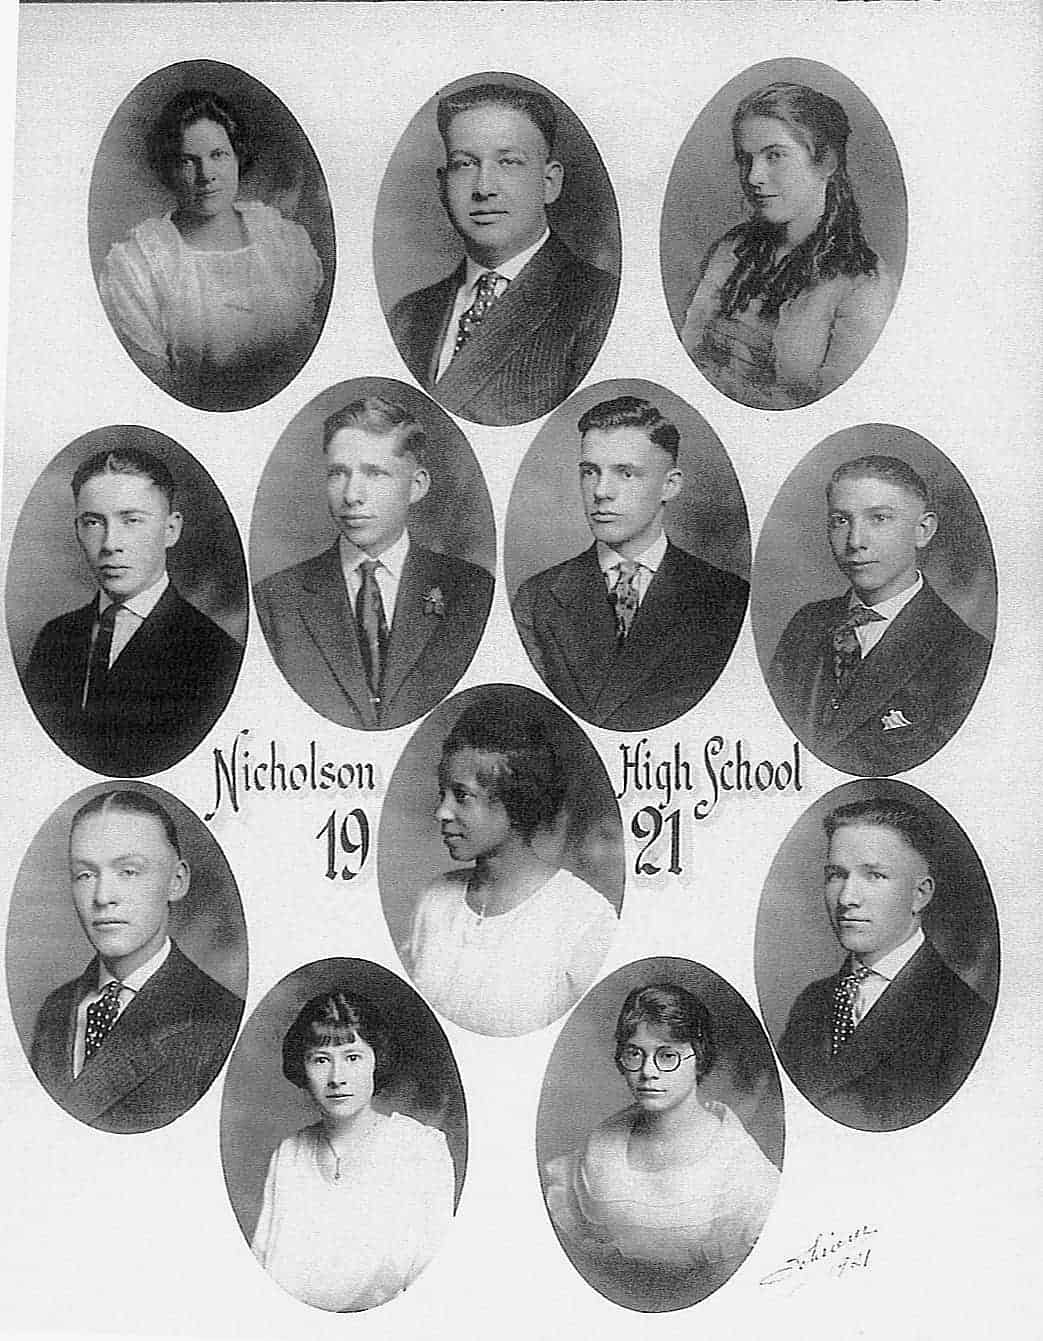 Nicholson 1921